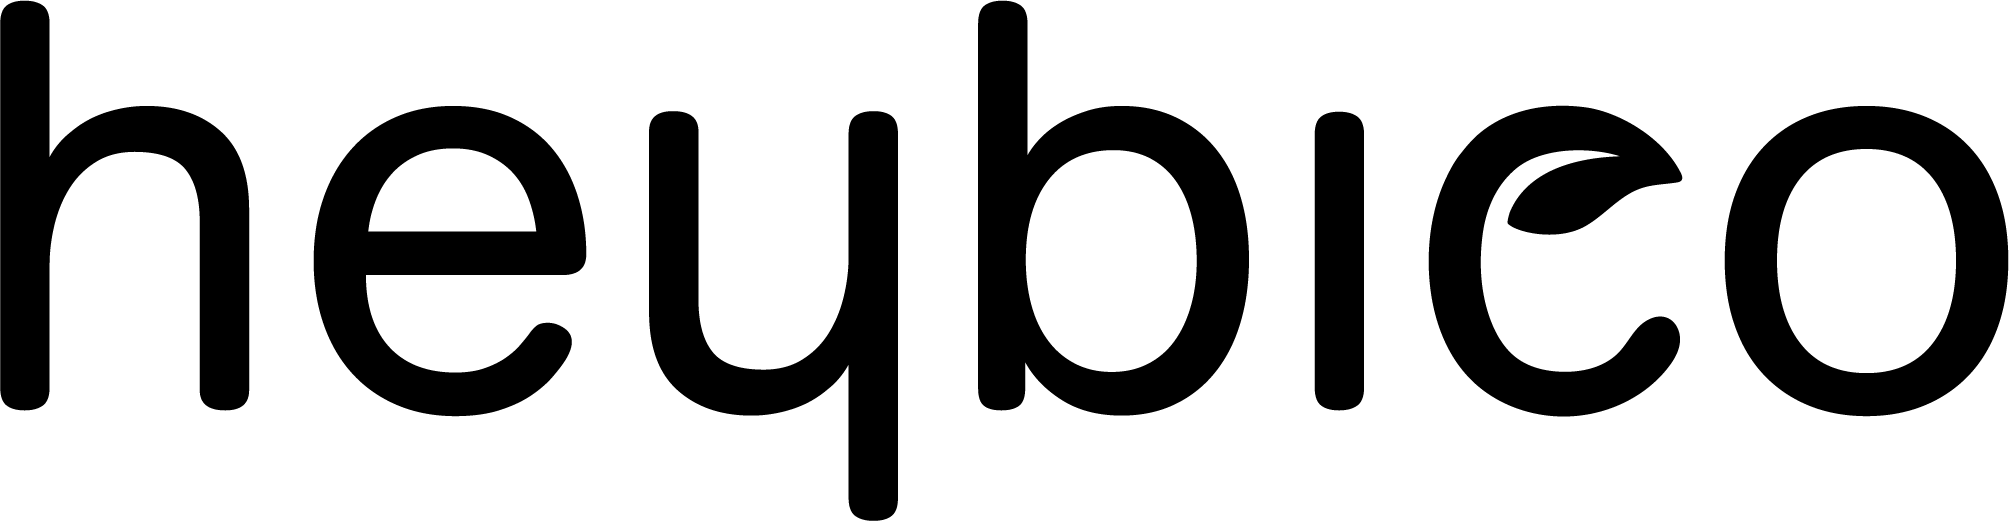 Logo heybico